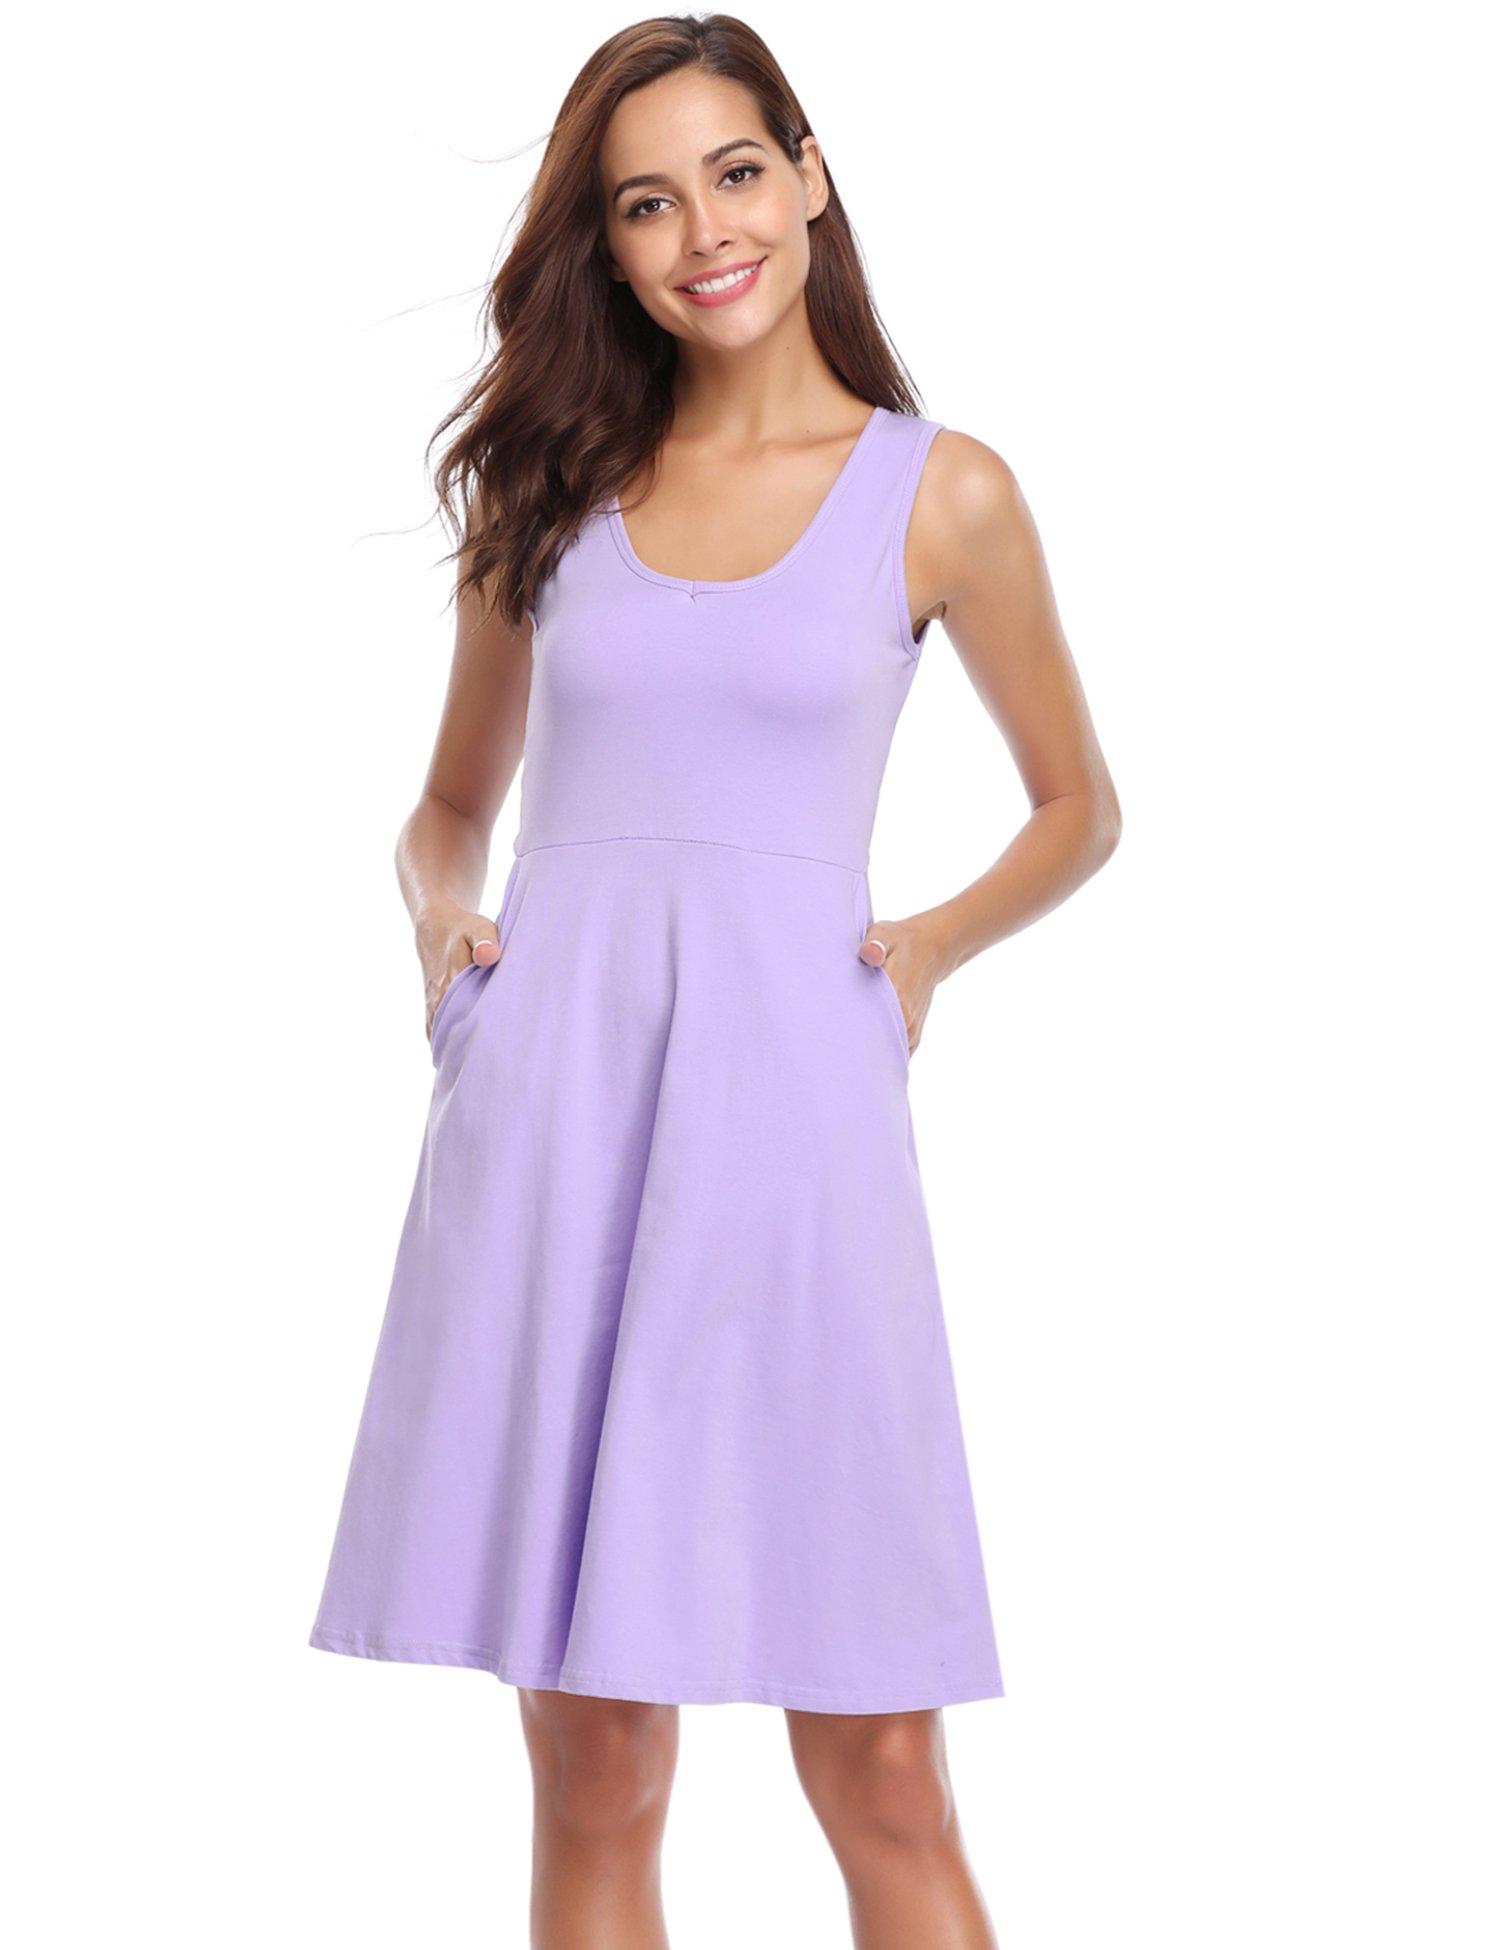 81c6b0df6311a8 Hawiton Damen Kleid Strandkleid Knielang T Shirt Kleid Casual Freizeitkleid  Sommerkleid Ärmlos product image